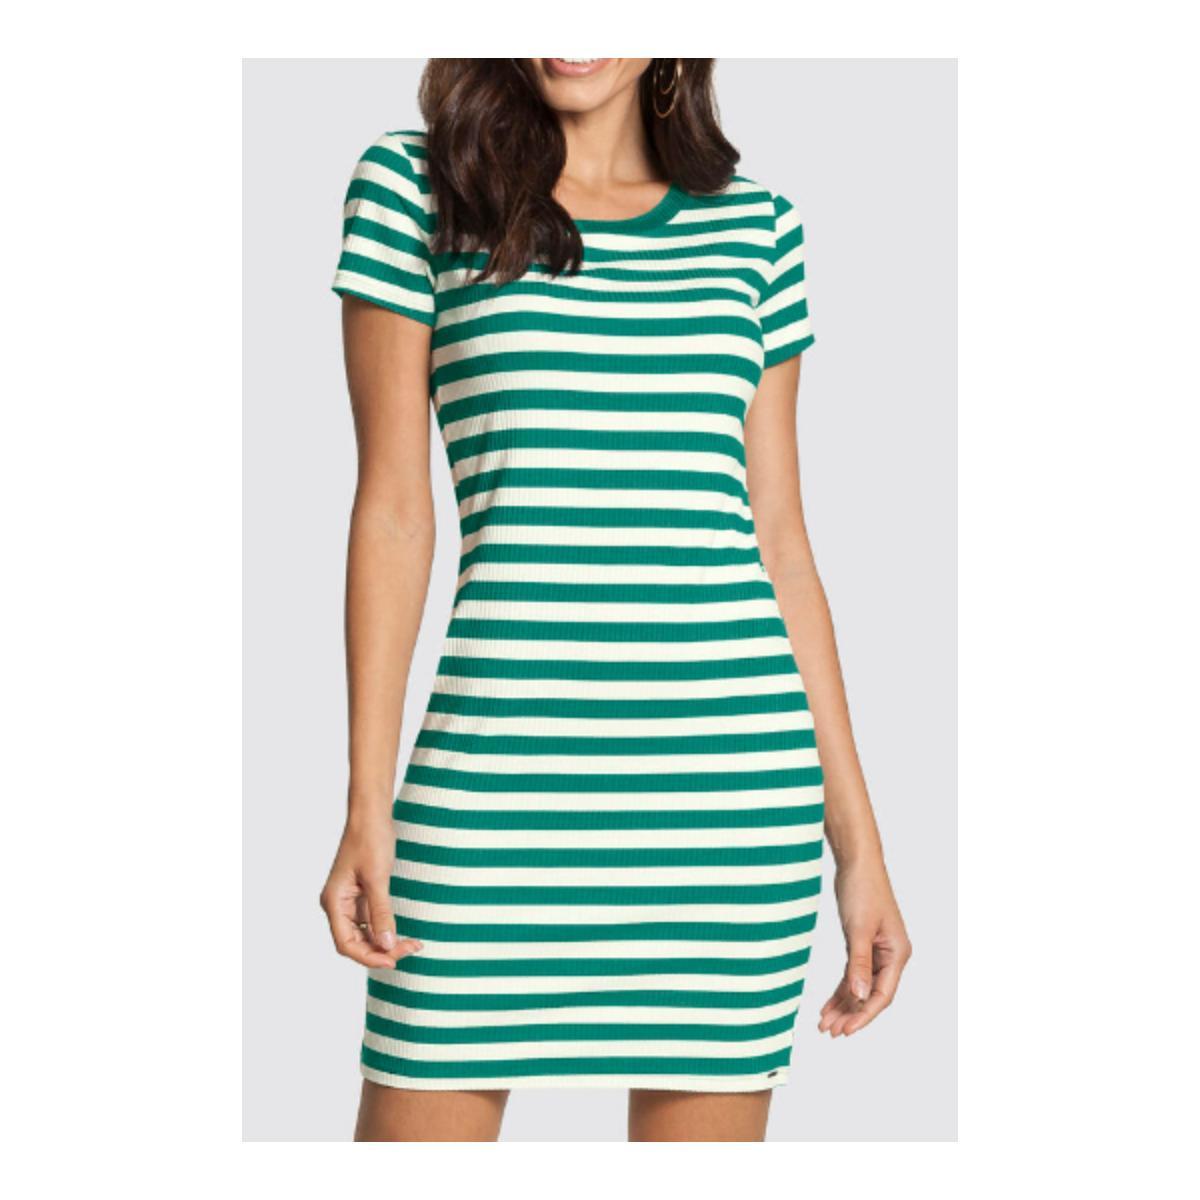 Vestido Feminino Lunender 46575 Verde